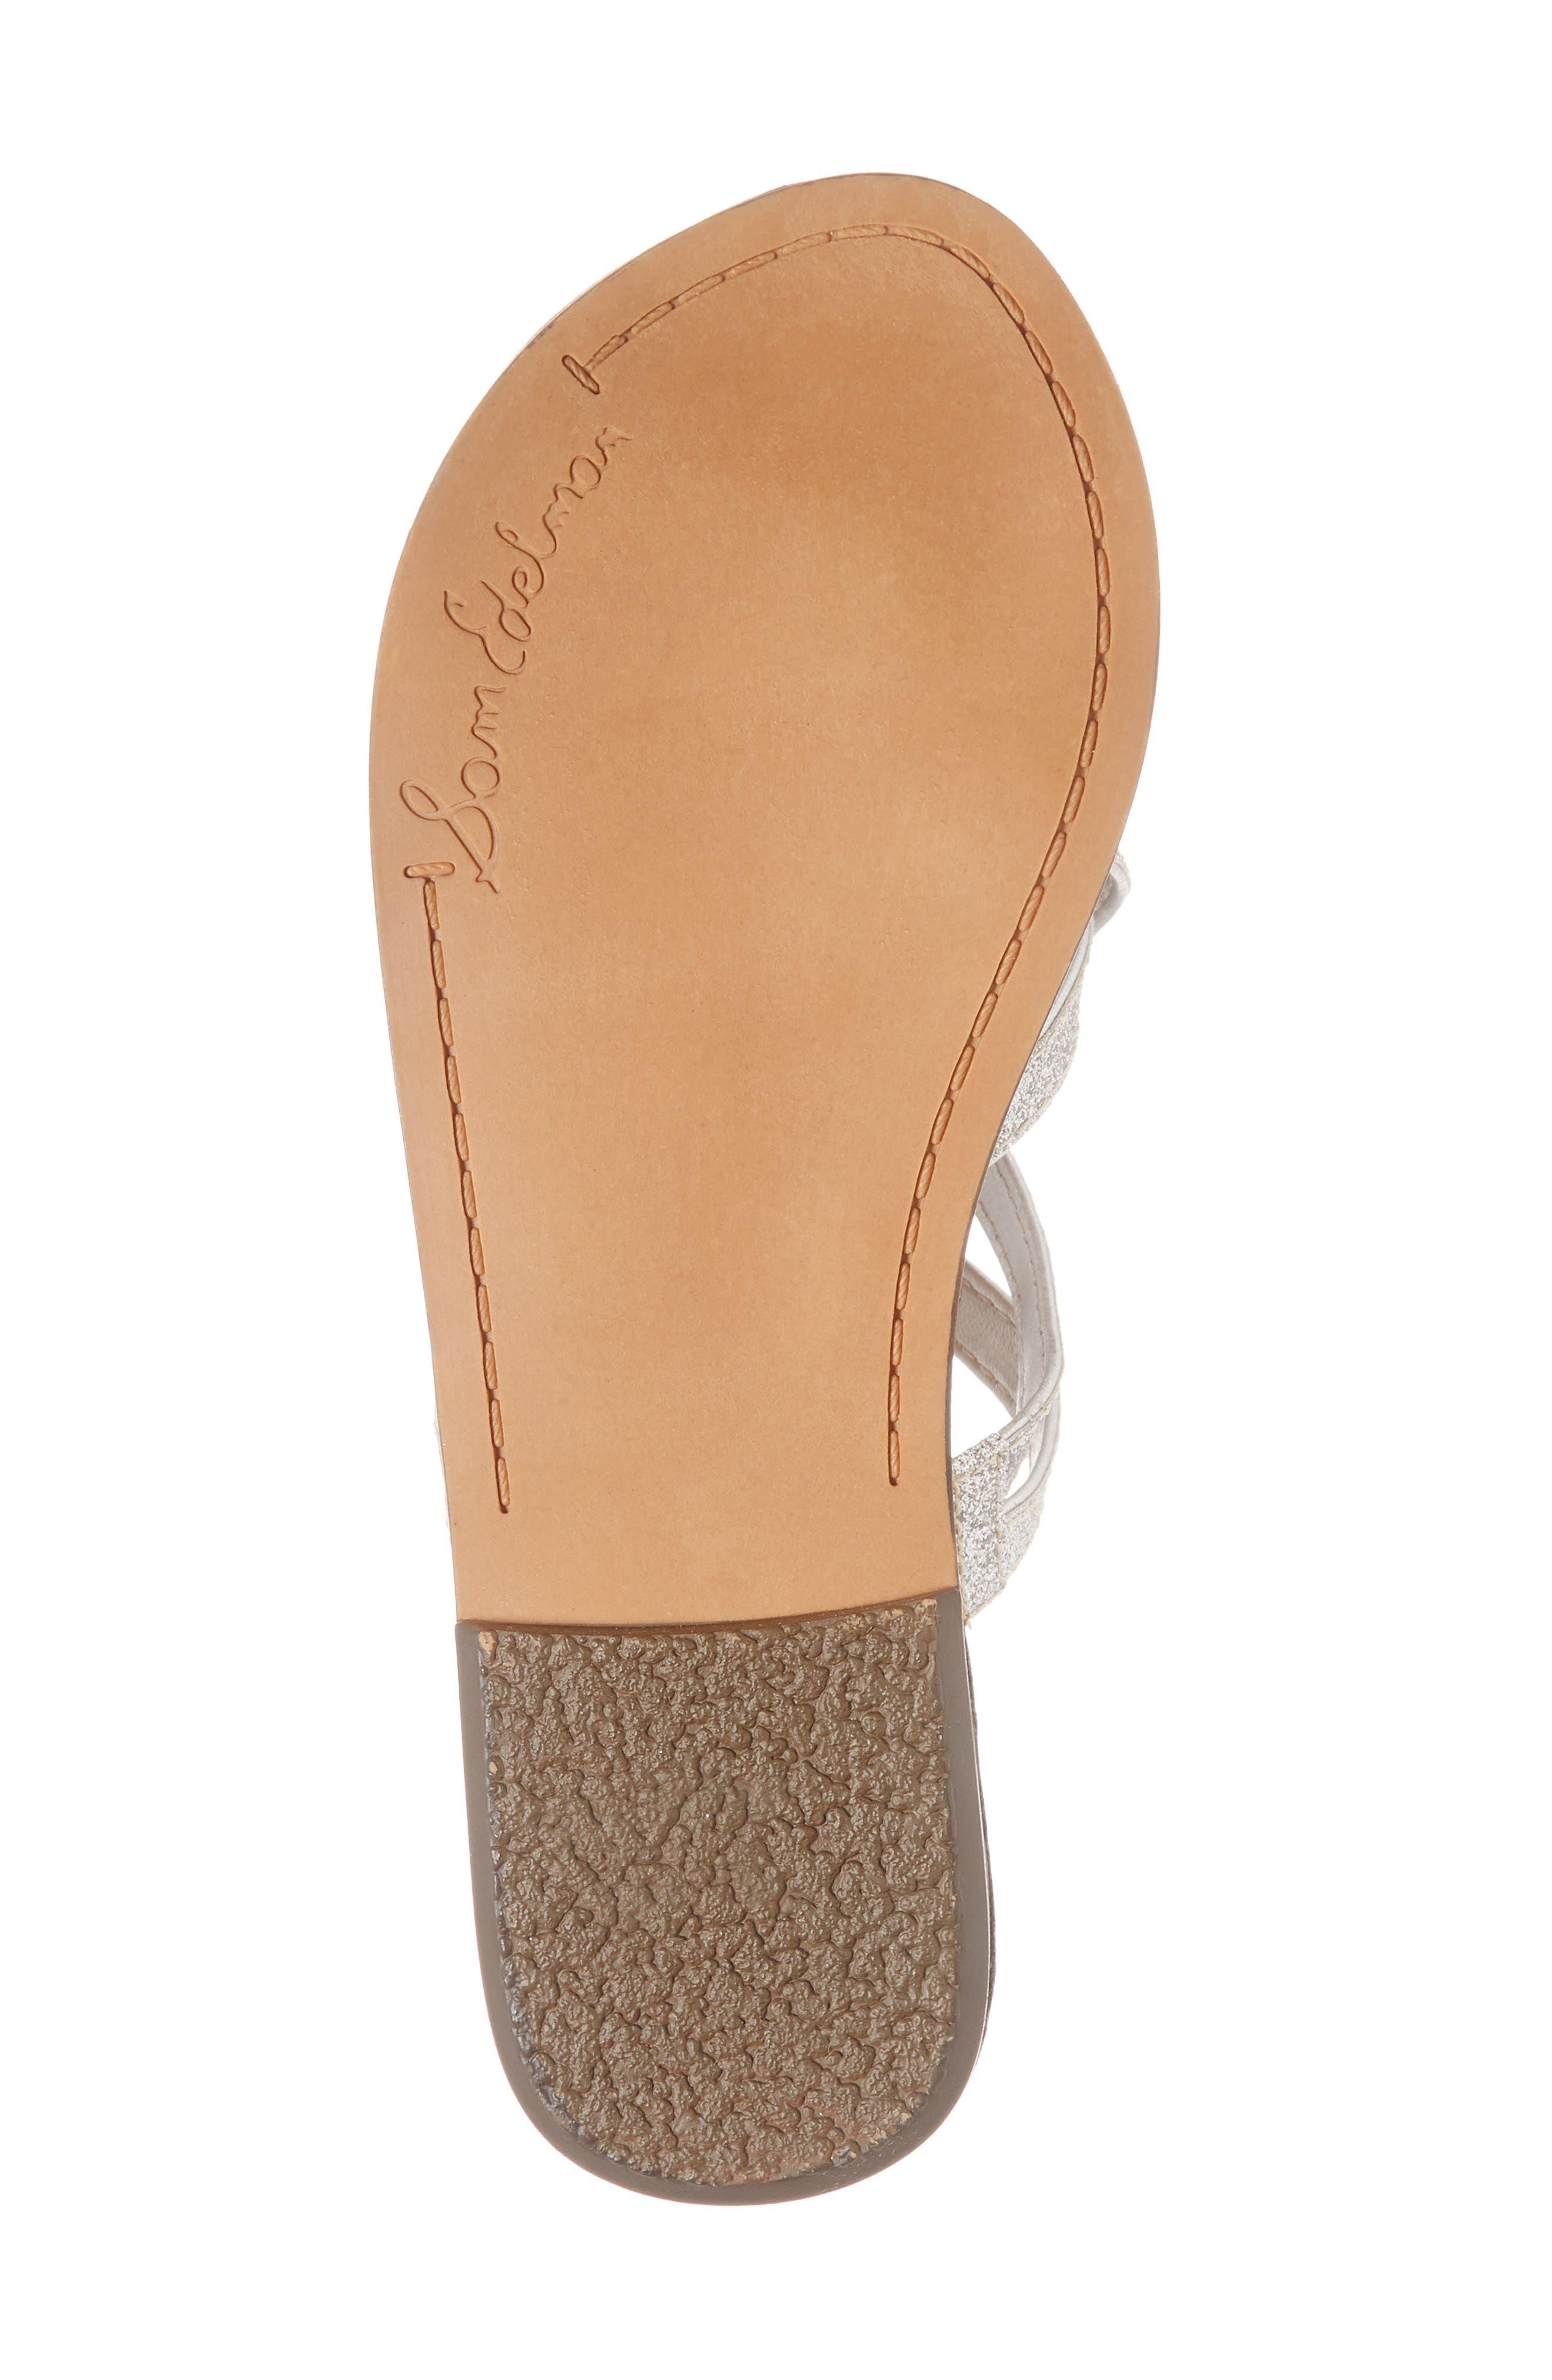 Georgette Glitter Flat Sandal,                             Alternate thumbnail 6, color,                             040